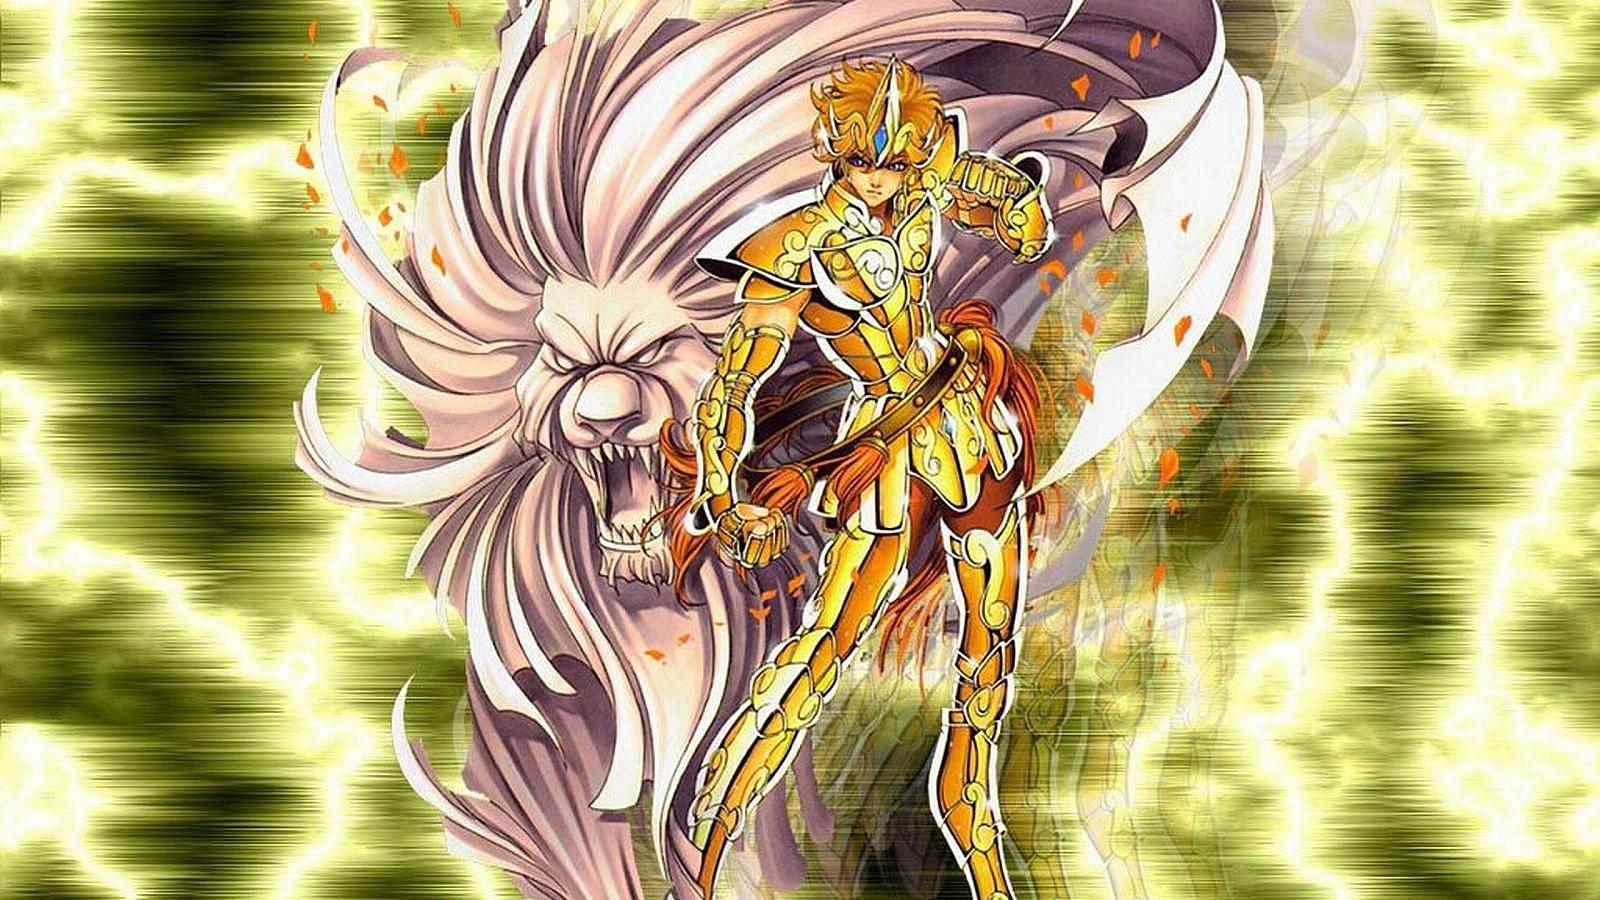 Free Download Wallpaper Saint Seiya The Lost Canvas Meiou Shinwa